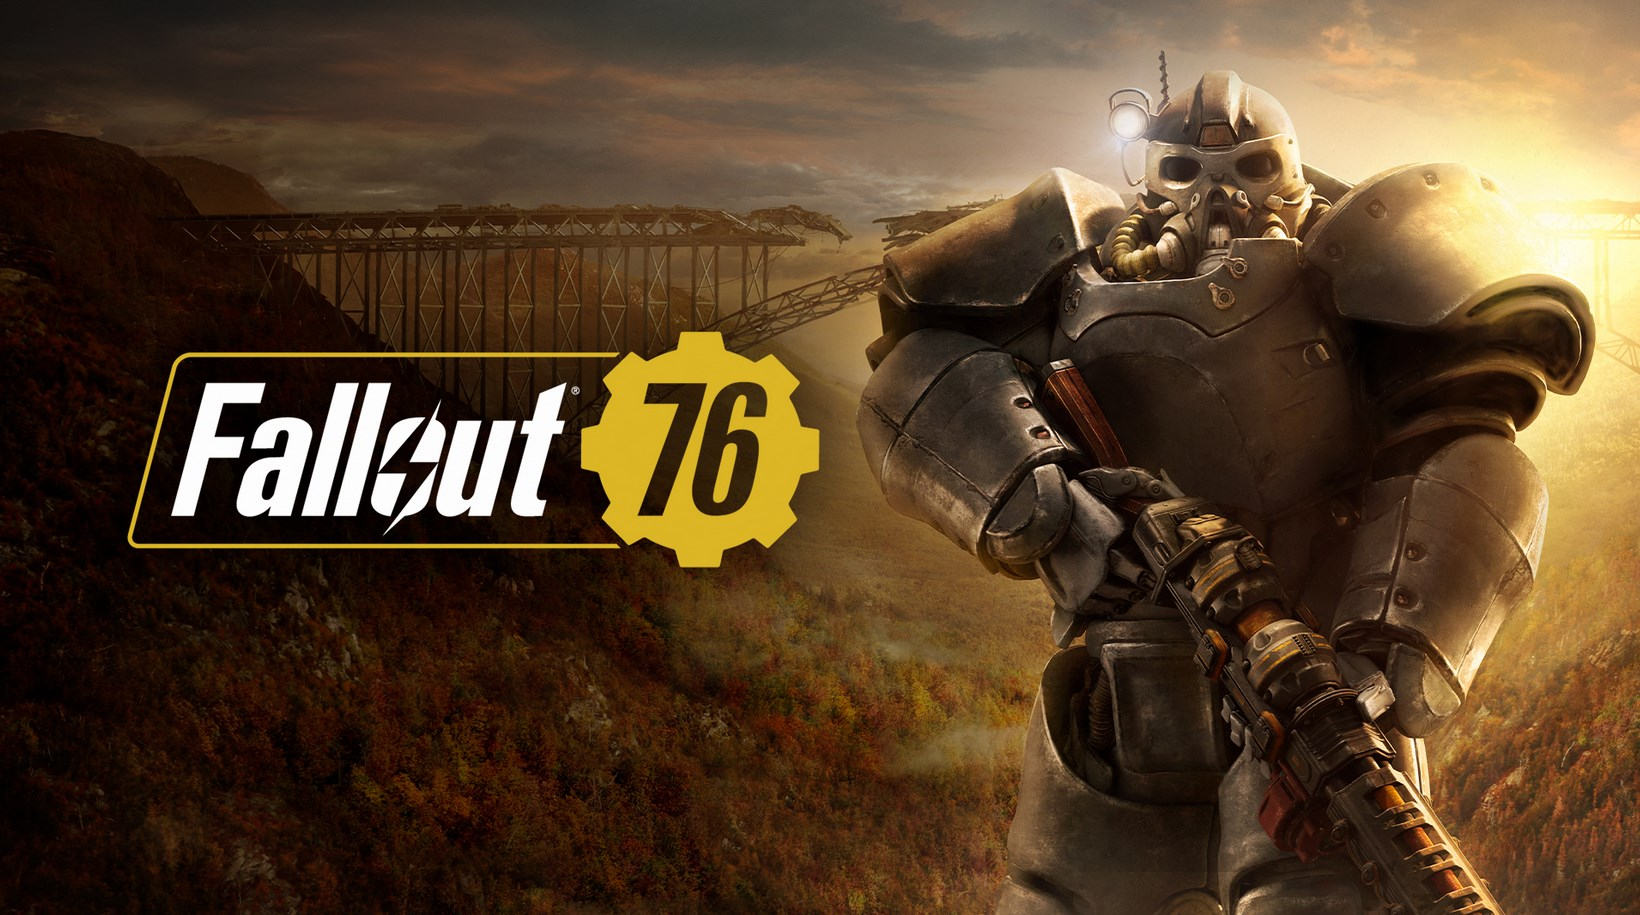 Juega durante una semana a Fallout 76